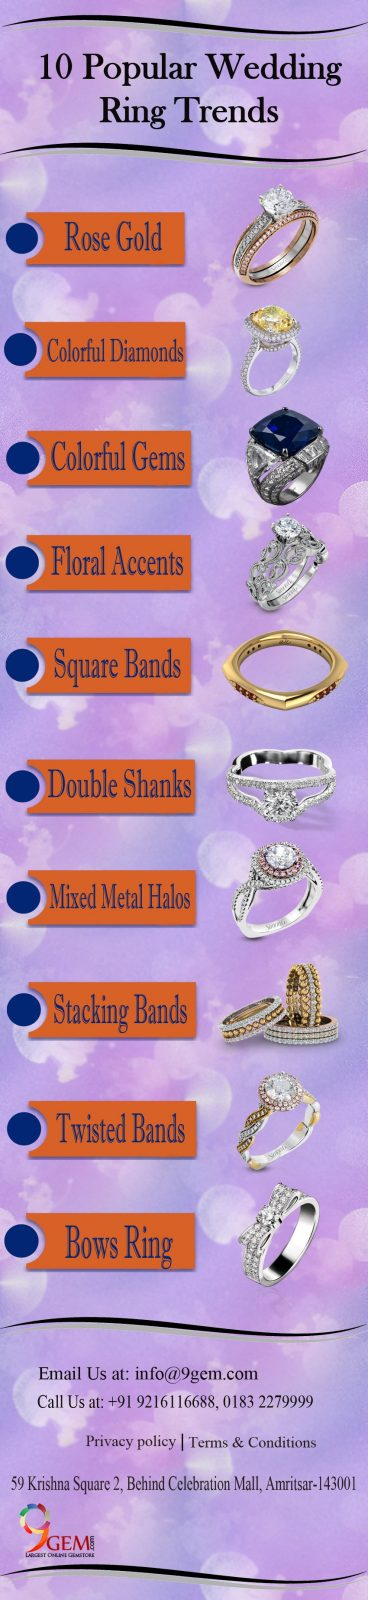 10 Popular Wedding Ring Trends